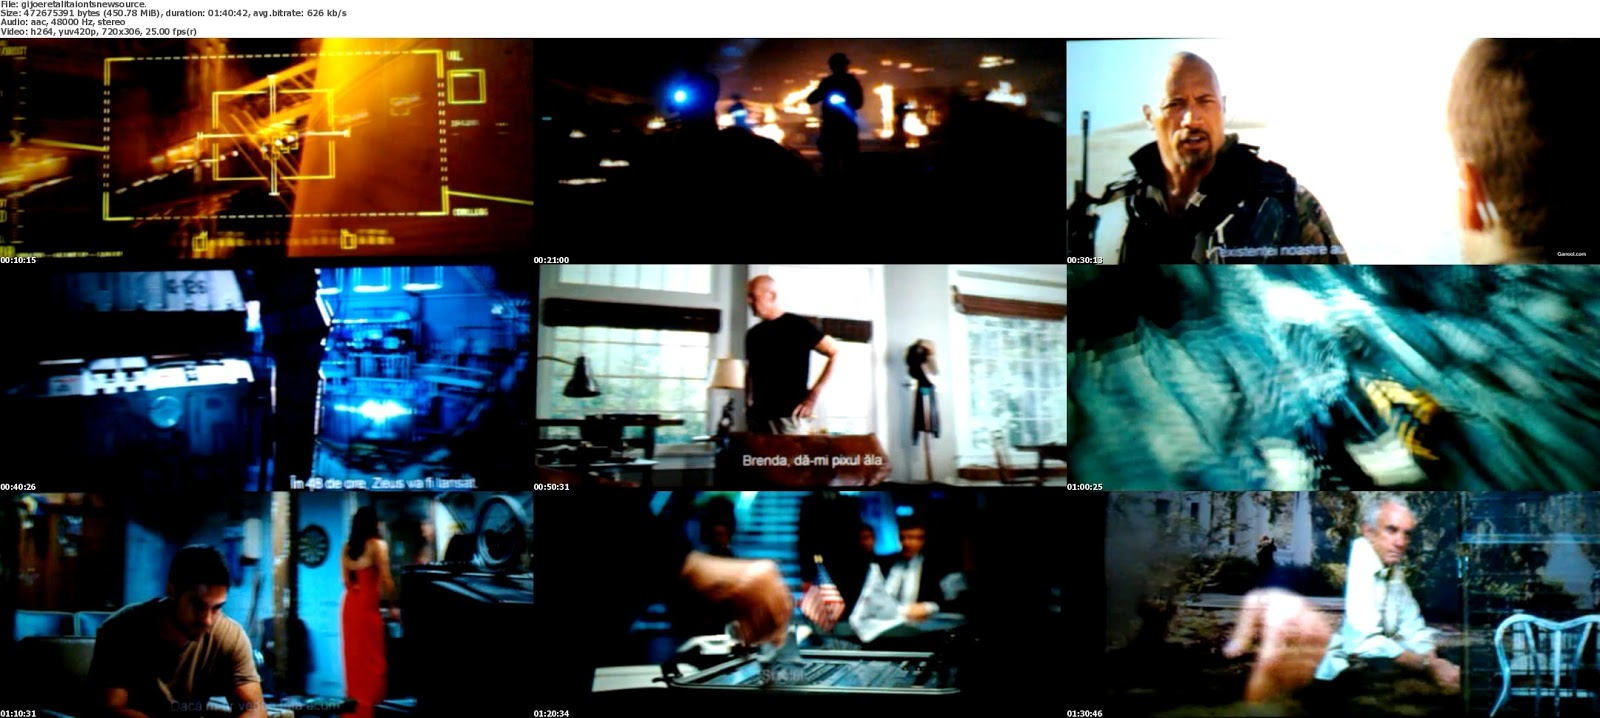 G.I.+Joe++Retaliation+(2013)+TS+NEWSOURCE+450MB+Hnmovies G.I. Joe: Retaliation (2013) TS NEWSOURCE 450MB